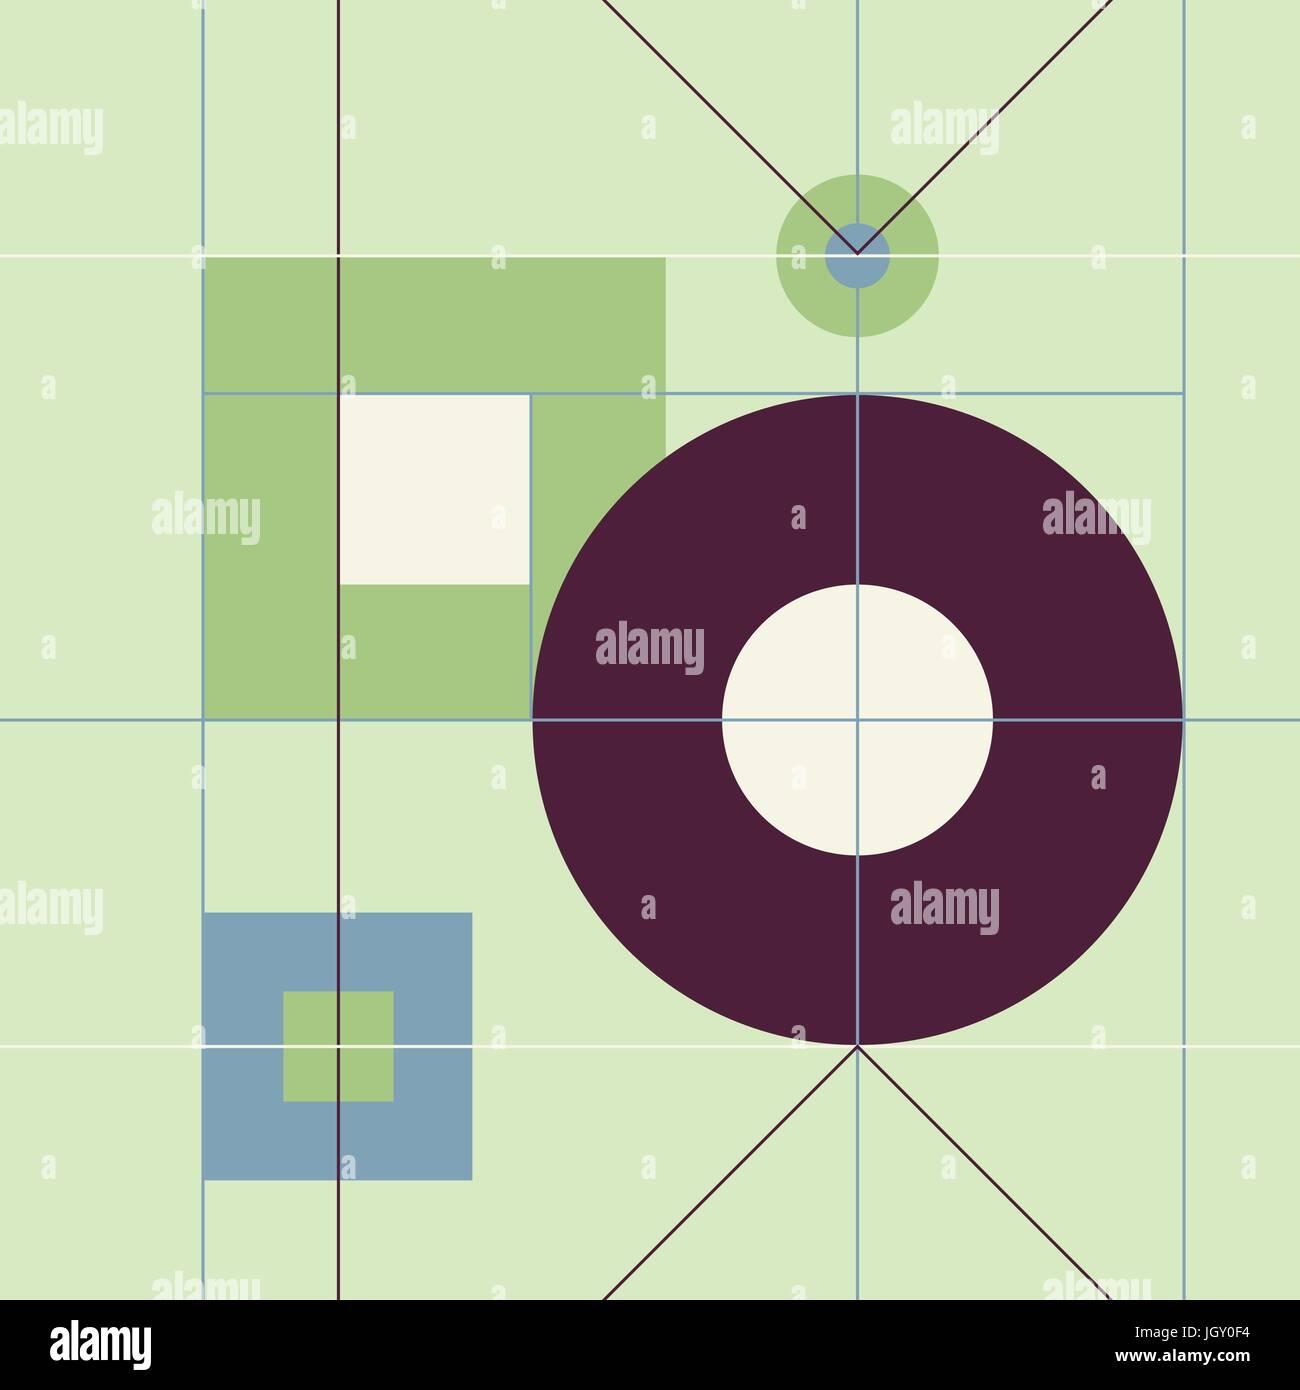 Mid Century Modern 1950s Style Vintage Retro Atomic Seamless Background  Pattern. Fully Editable Vector Illustration